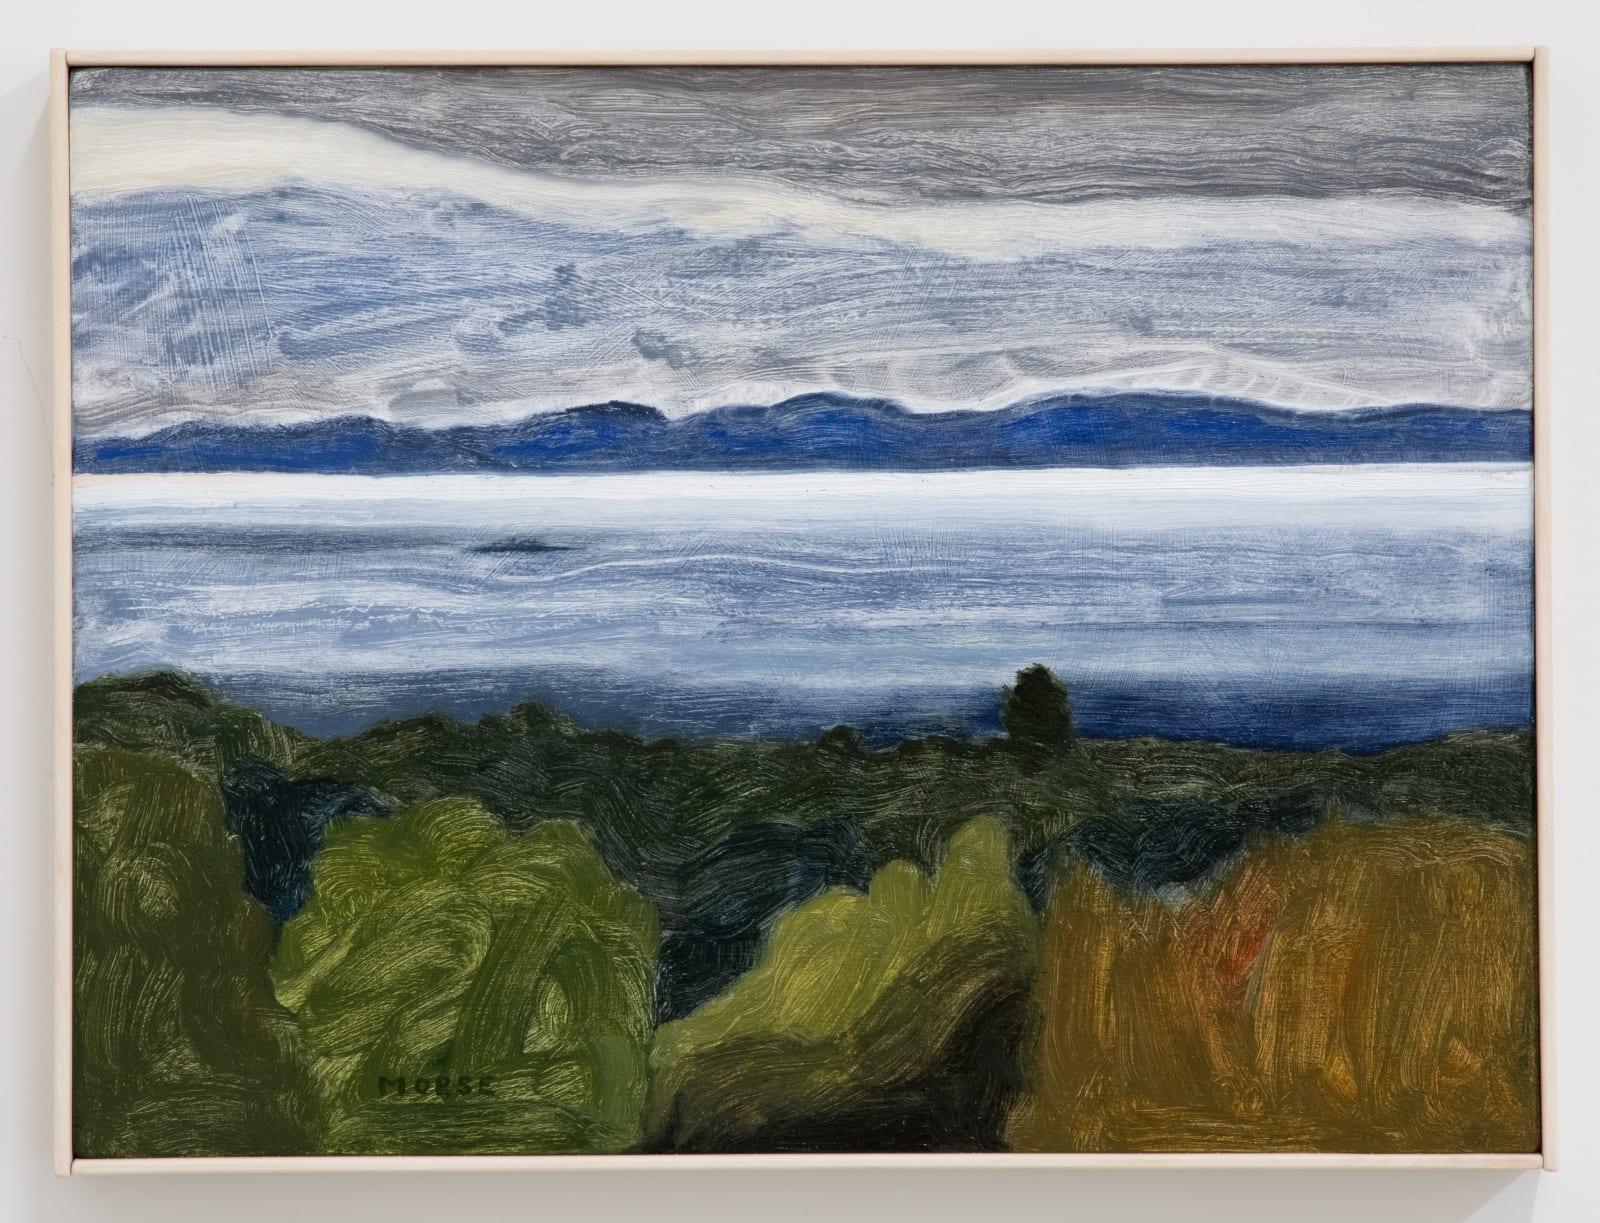 James Morse, Gull Island, 2021